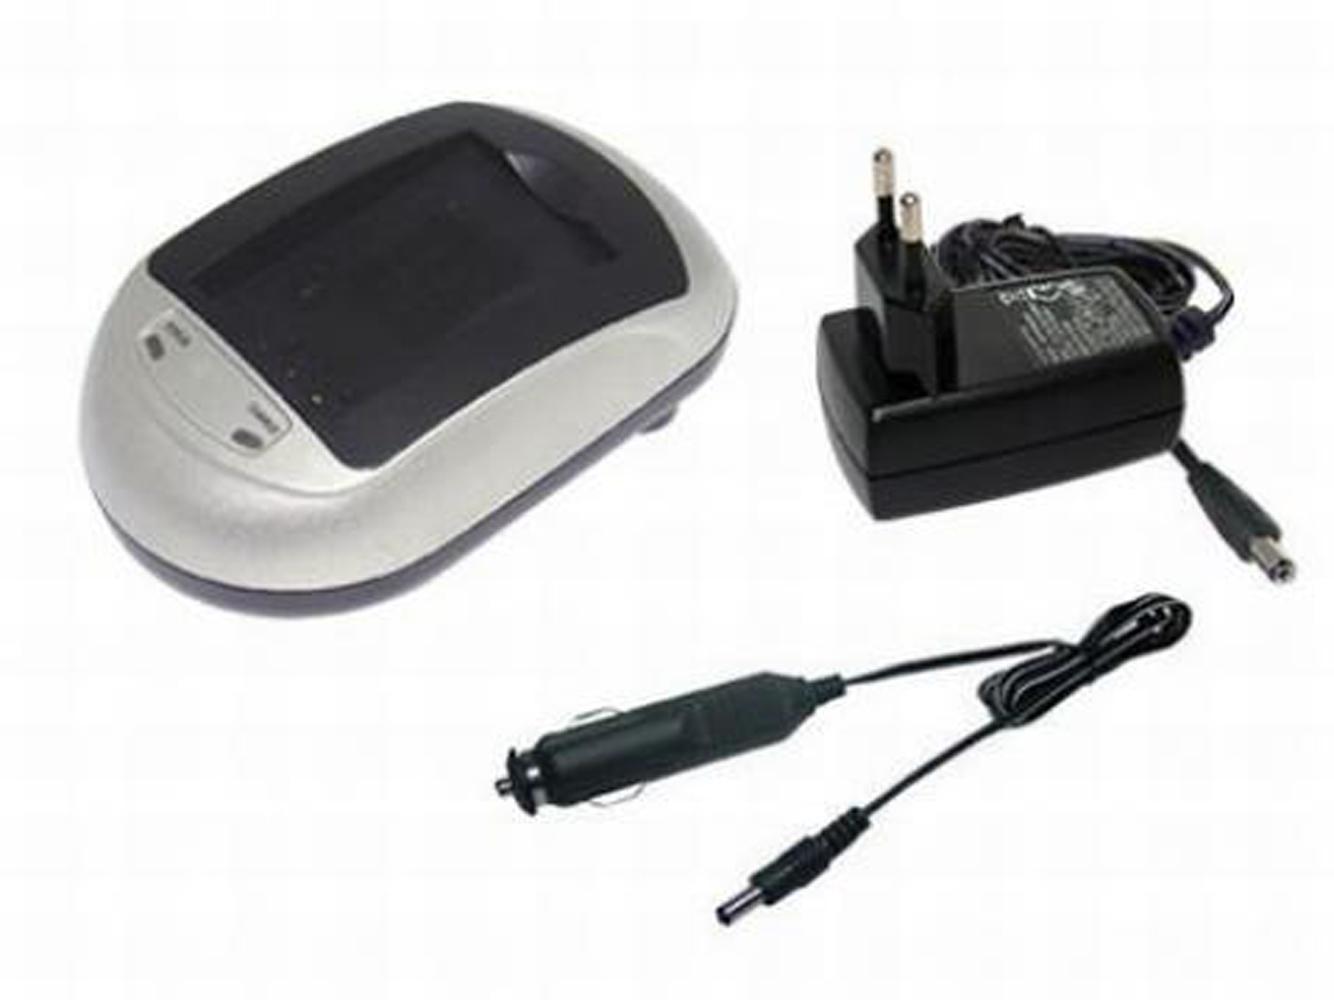 Cargador USB para Fujifilm finepix f10 f410 zoom m603 zoom f11 zoom